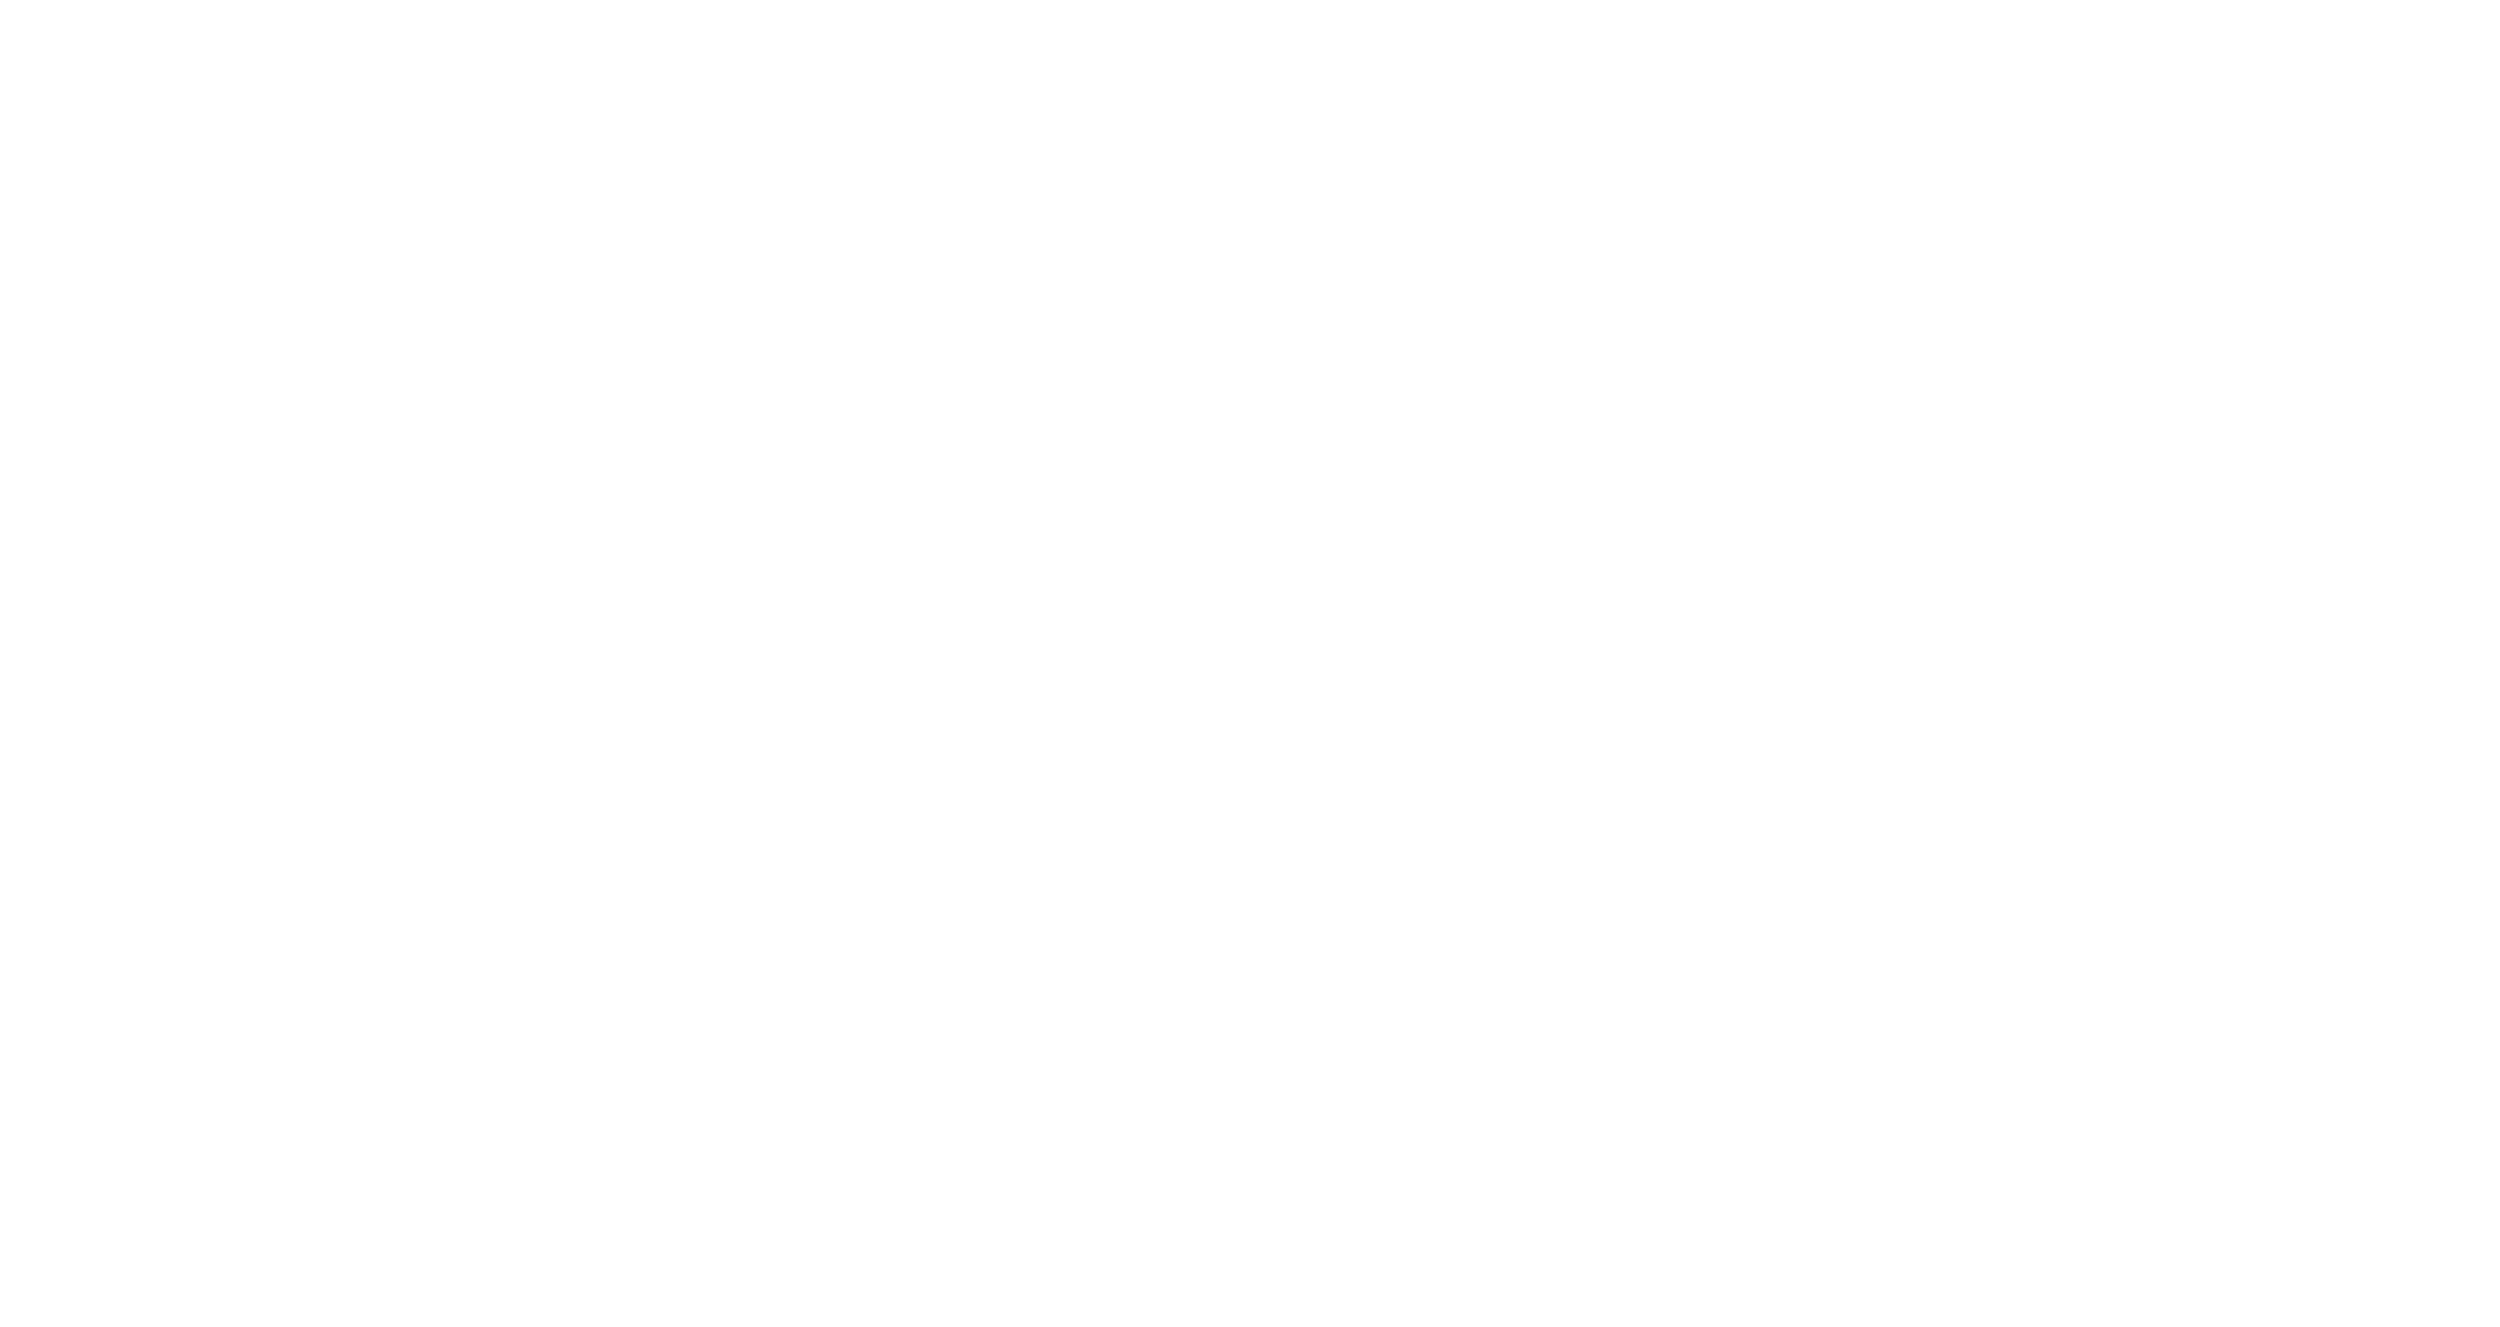 Artemis Boutique Booking Agency